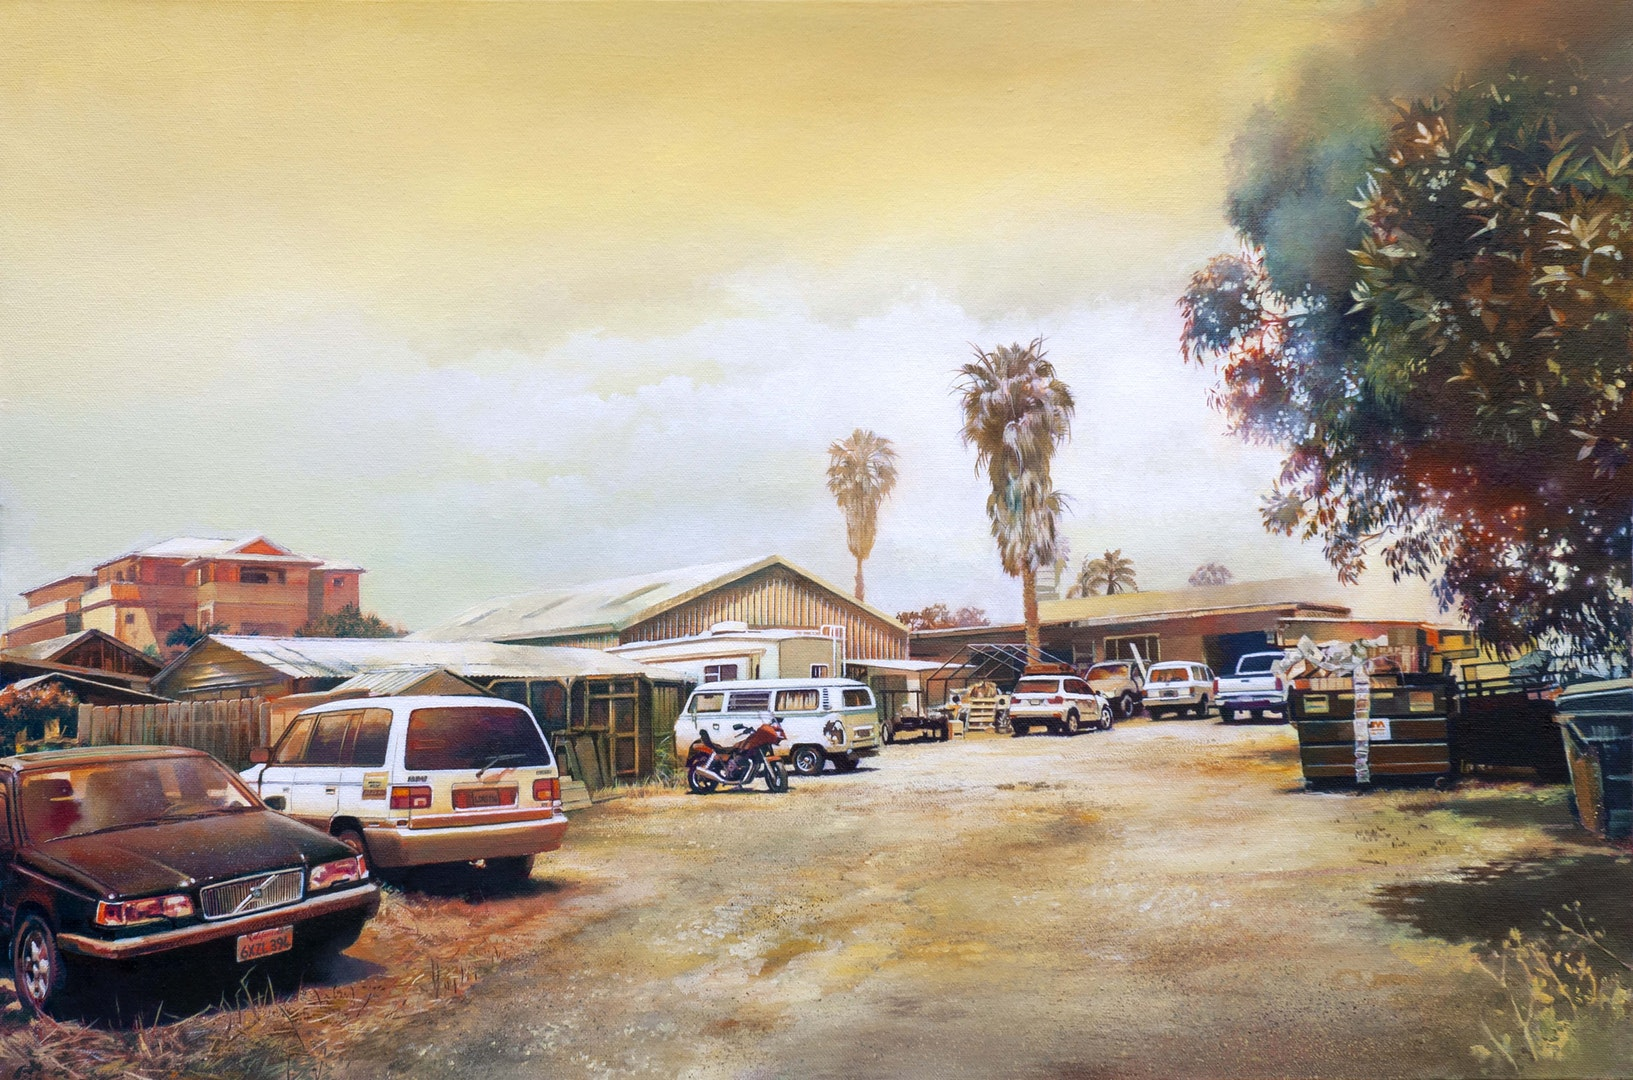 'Carlsbad', John Ball, Oil on canvas, 51 x 76 x 3.5 cm